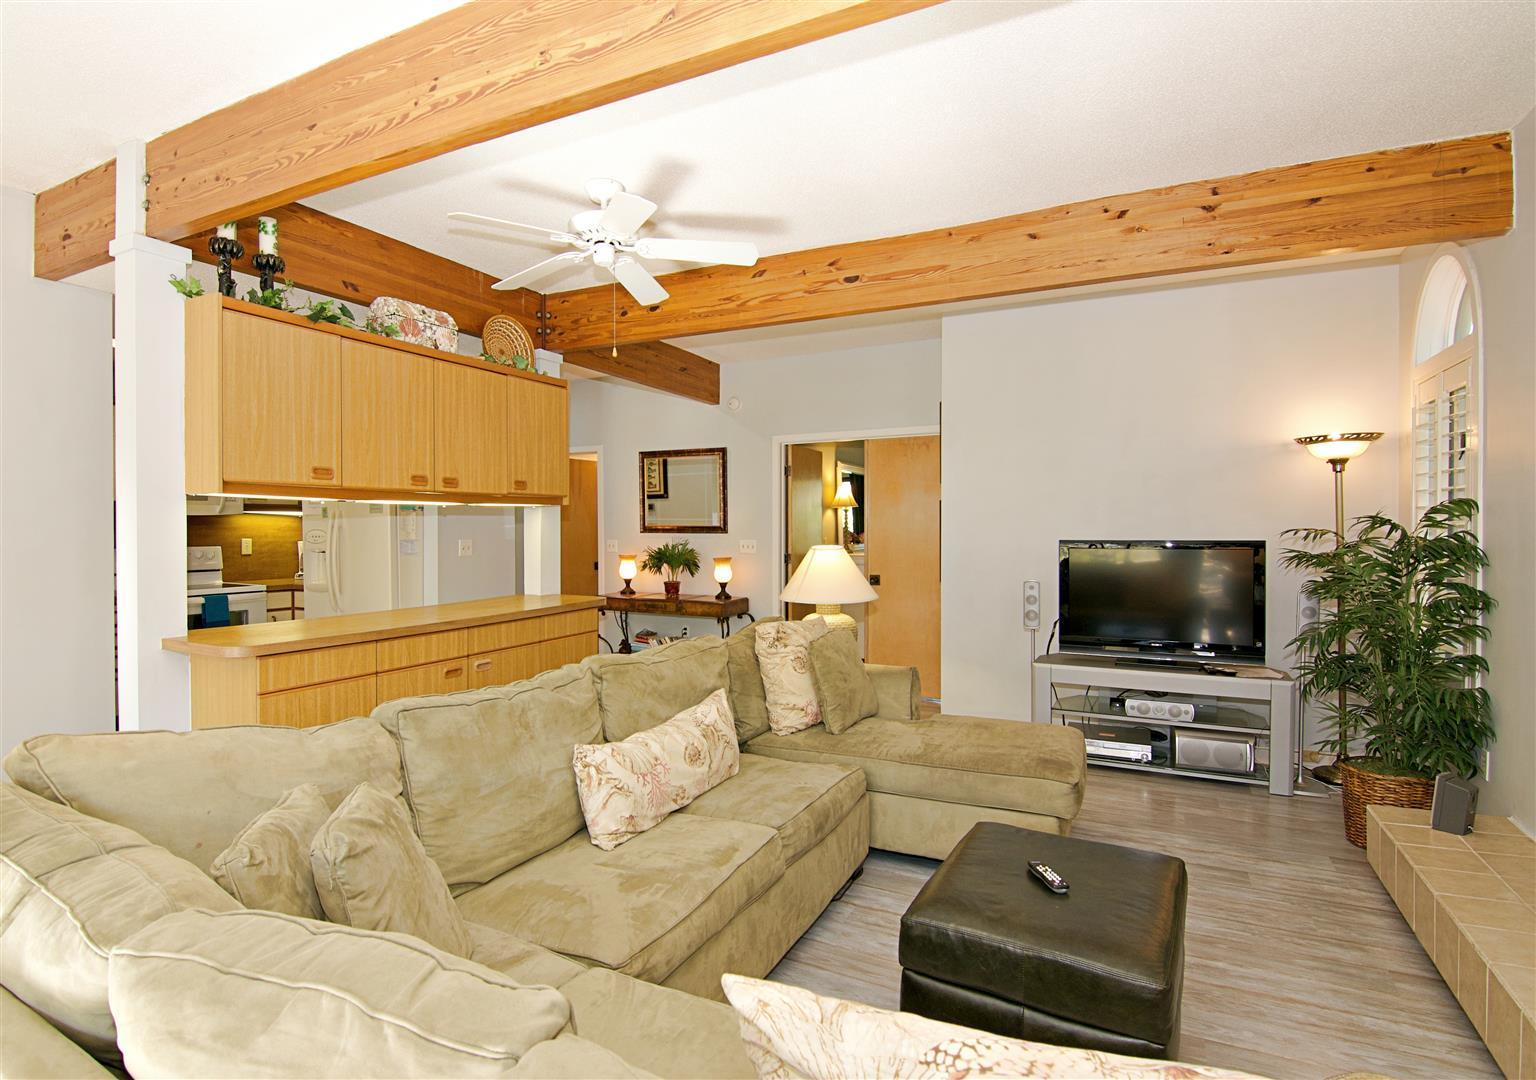 Seabrook Island Homes For Sale - 3020 Ocean Winds, Seabrook Island, SC - 2